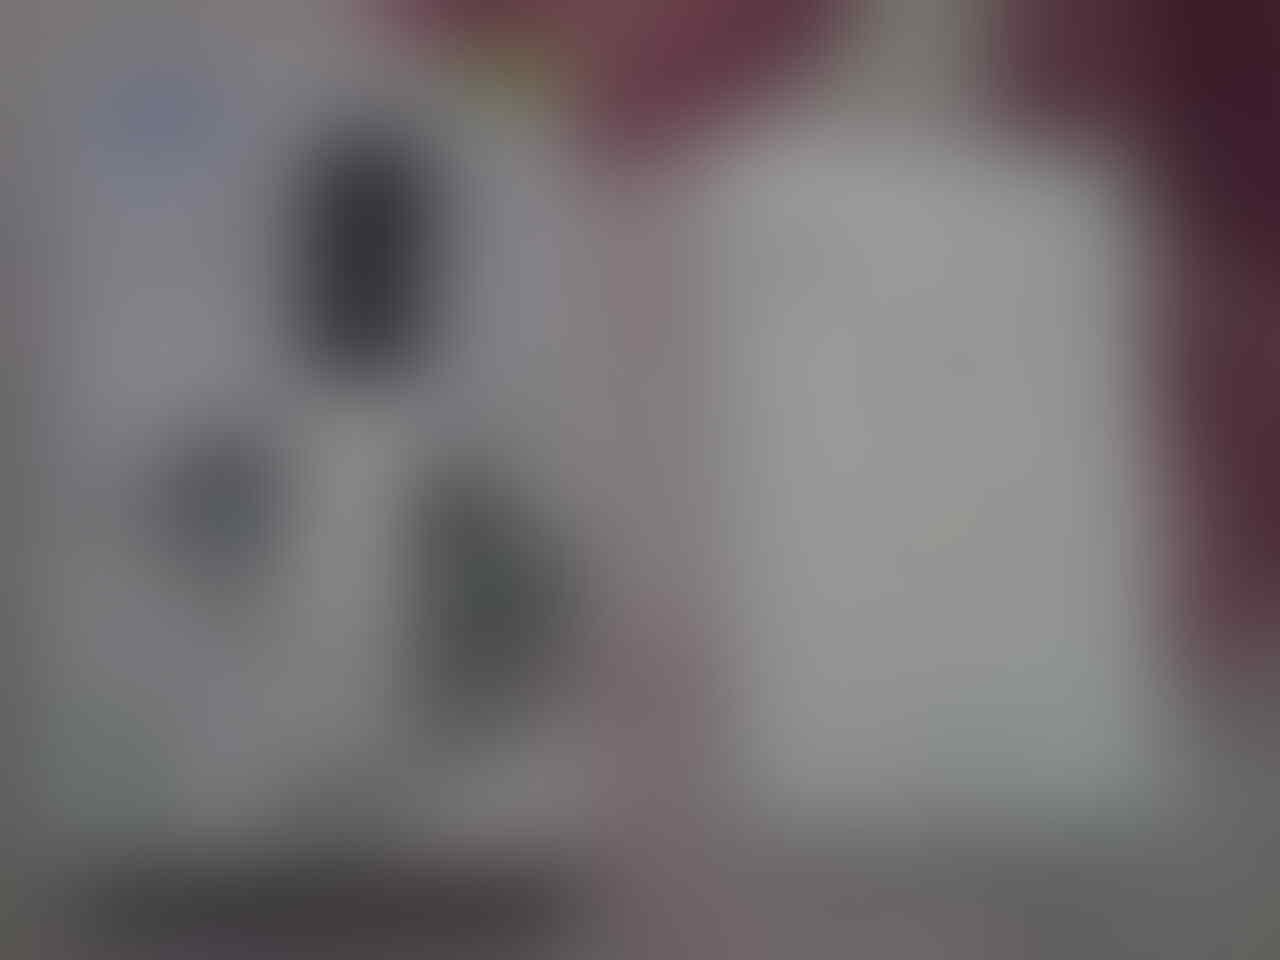 Galaxy Tab2 7inch P3110 Wifi White 8GB Fullset murah masuk dulu